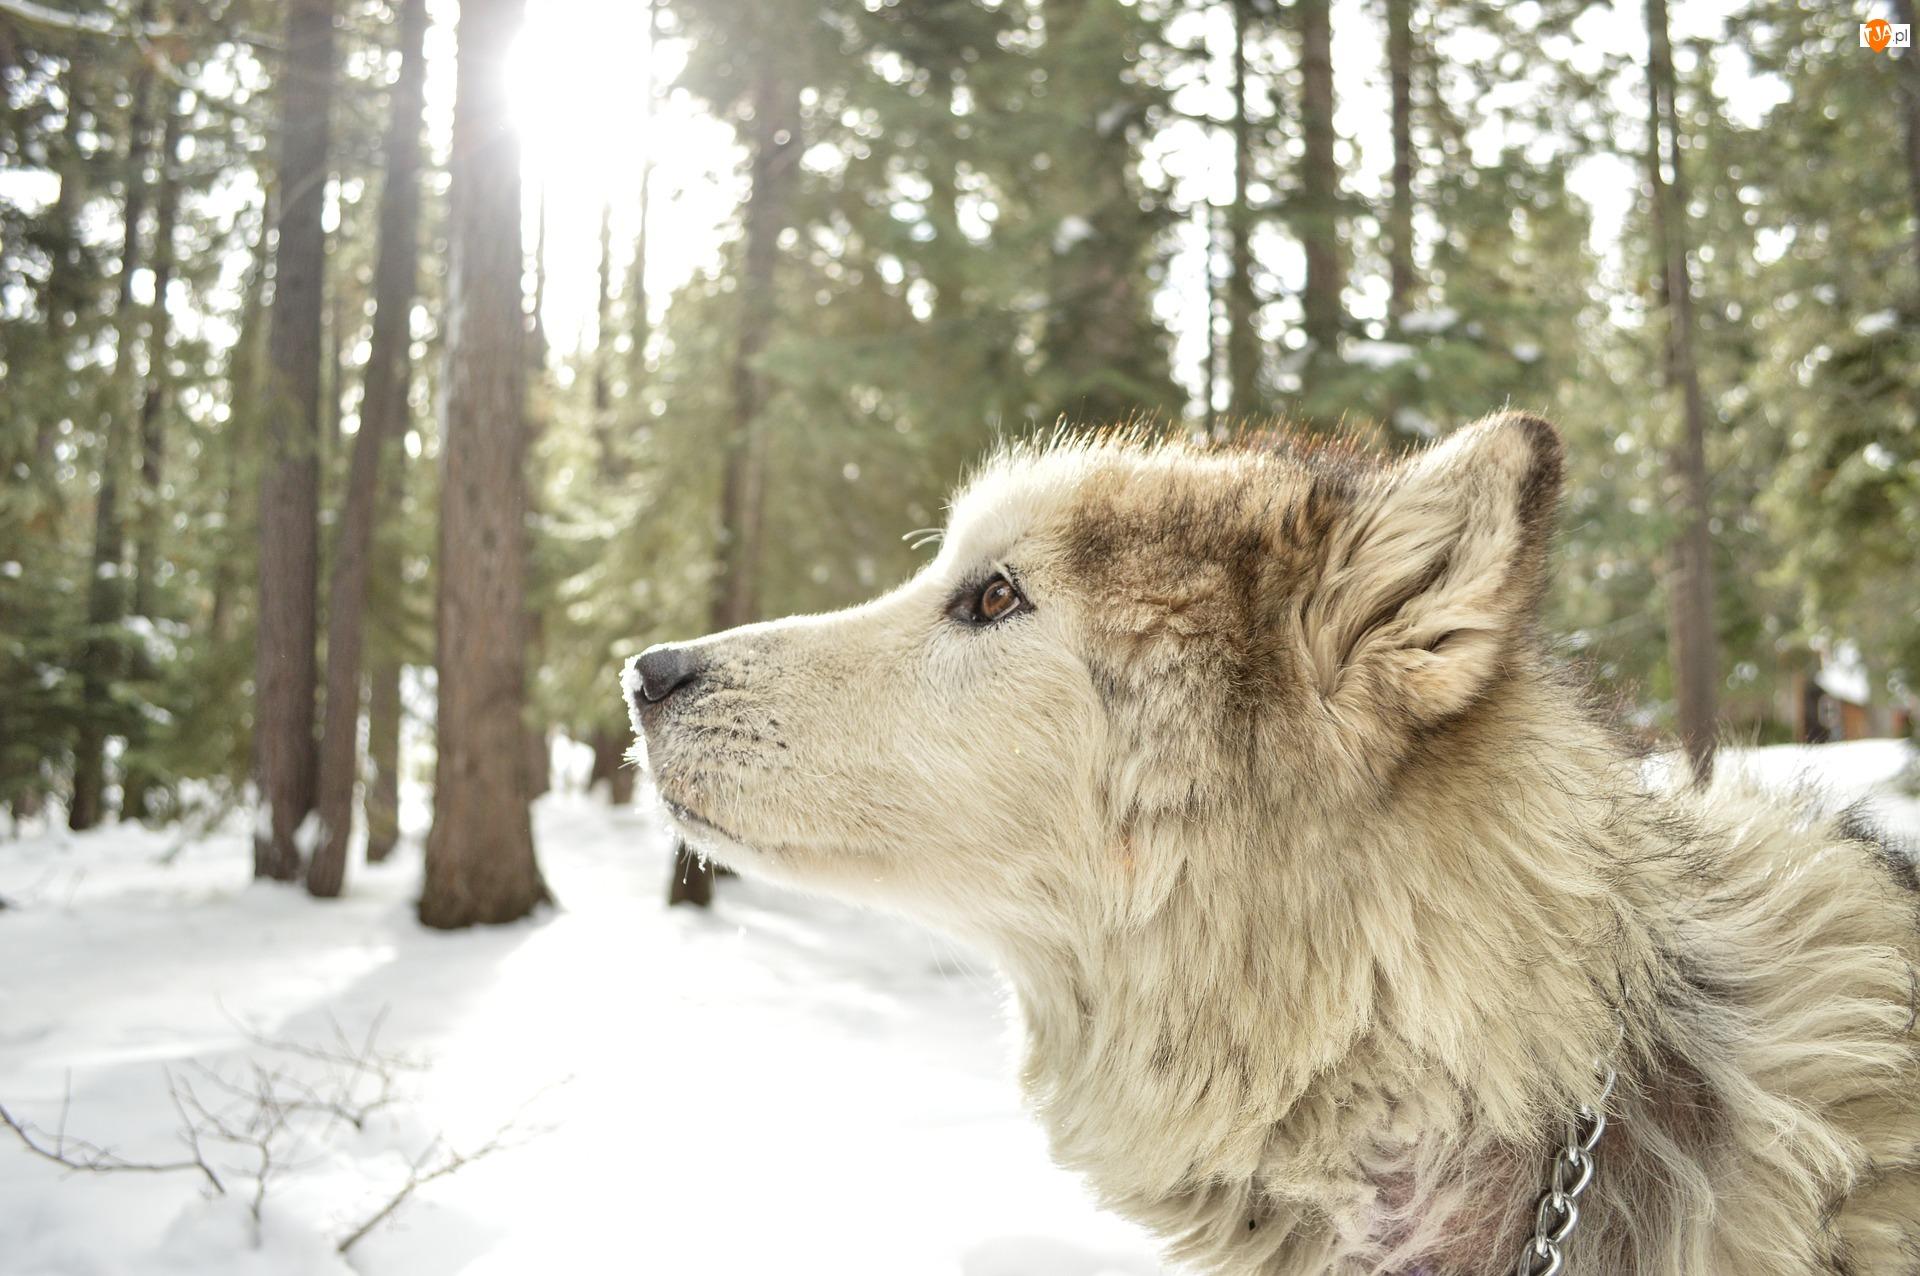 Profil, Zima, Głowa, Pies, Las